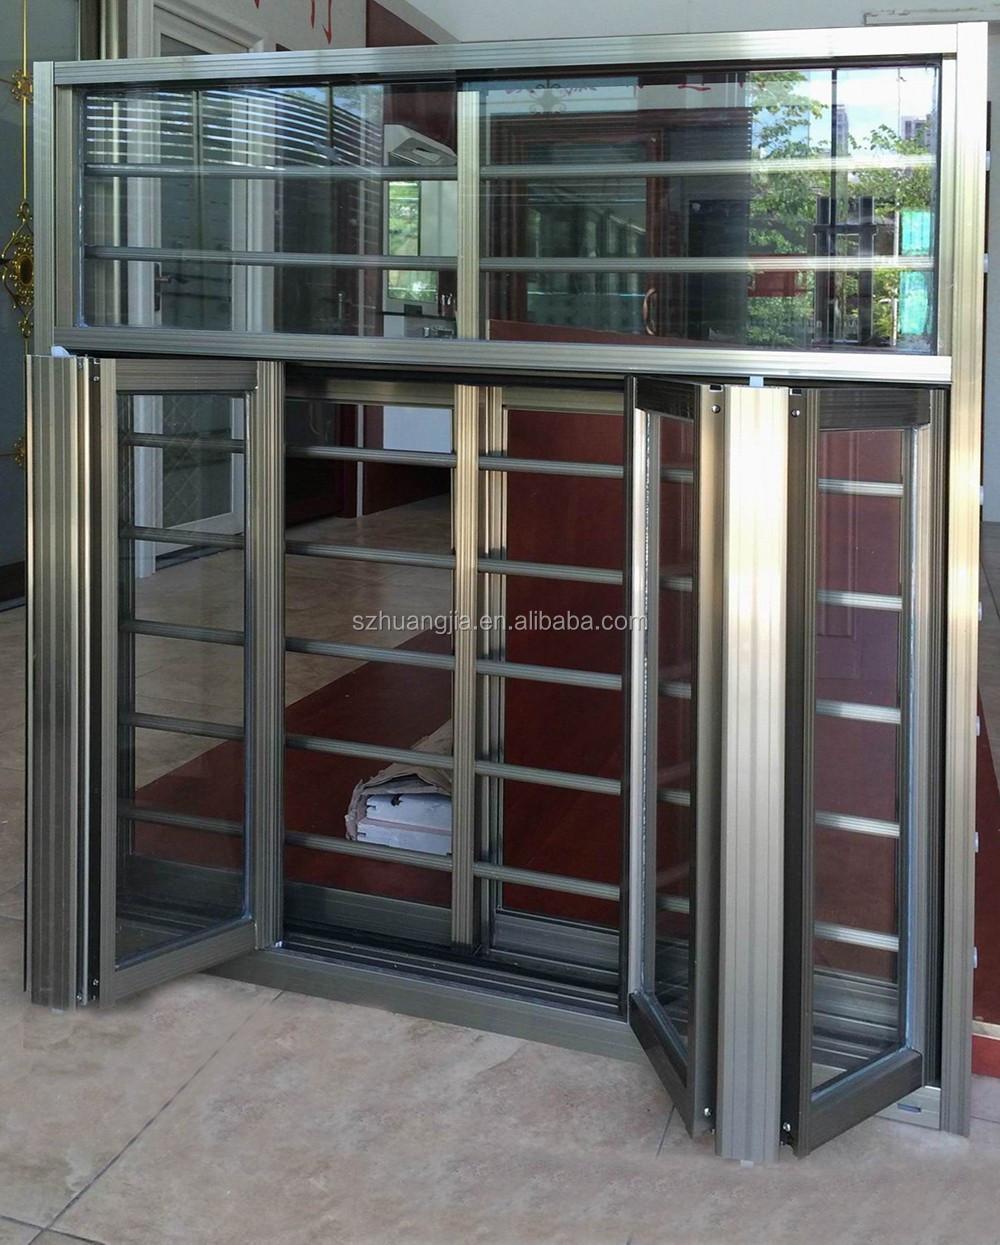 2017 Window Grills Design For Sliding Windows Buy Steel